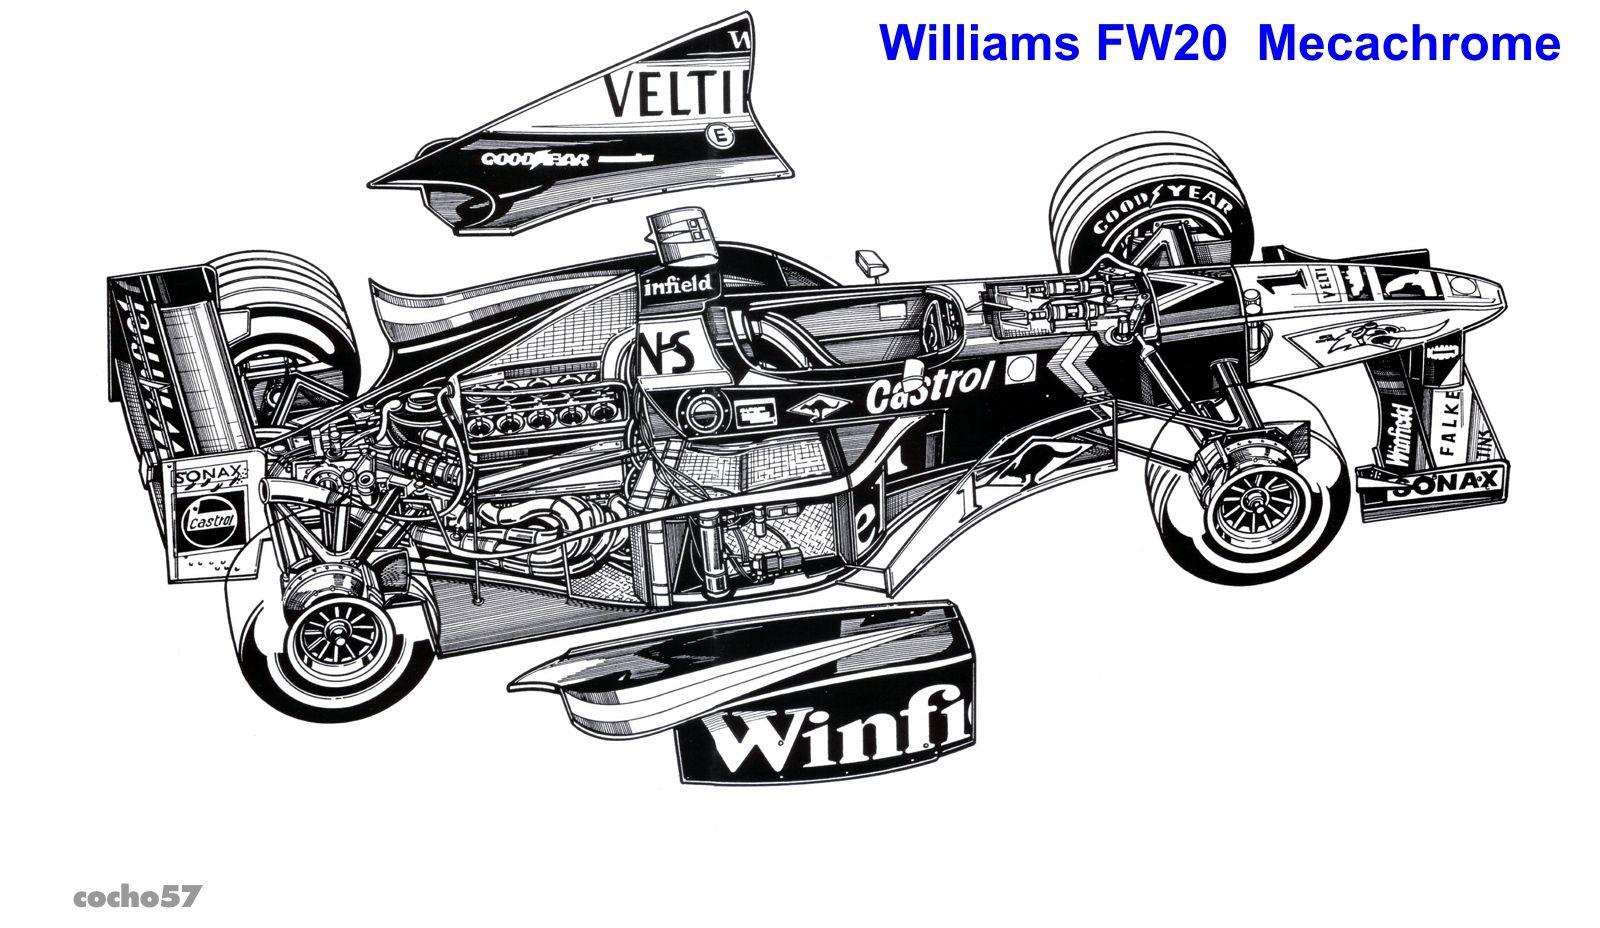 Williams Fw20 Mecachrome Diseno Patrick Head Y